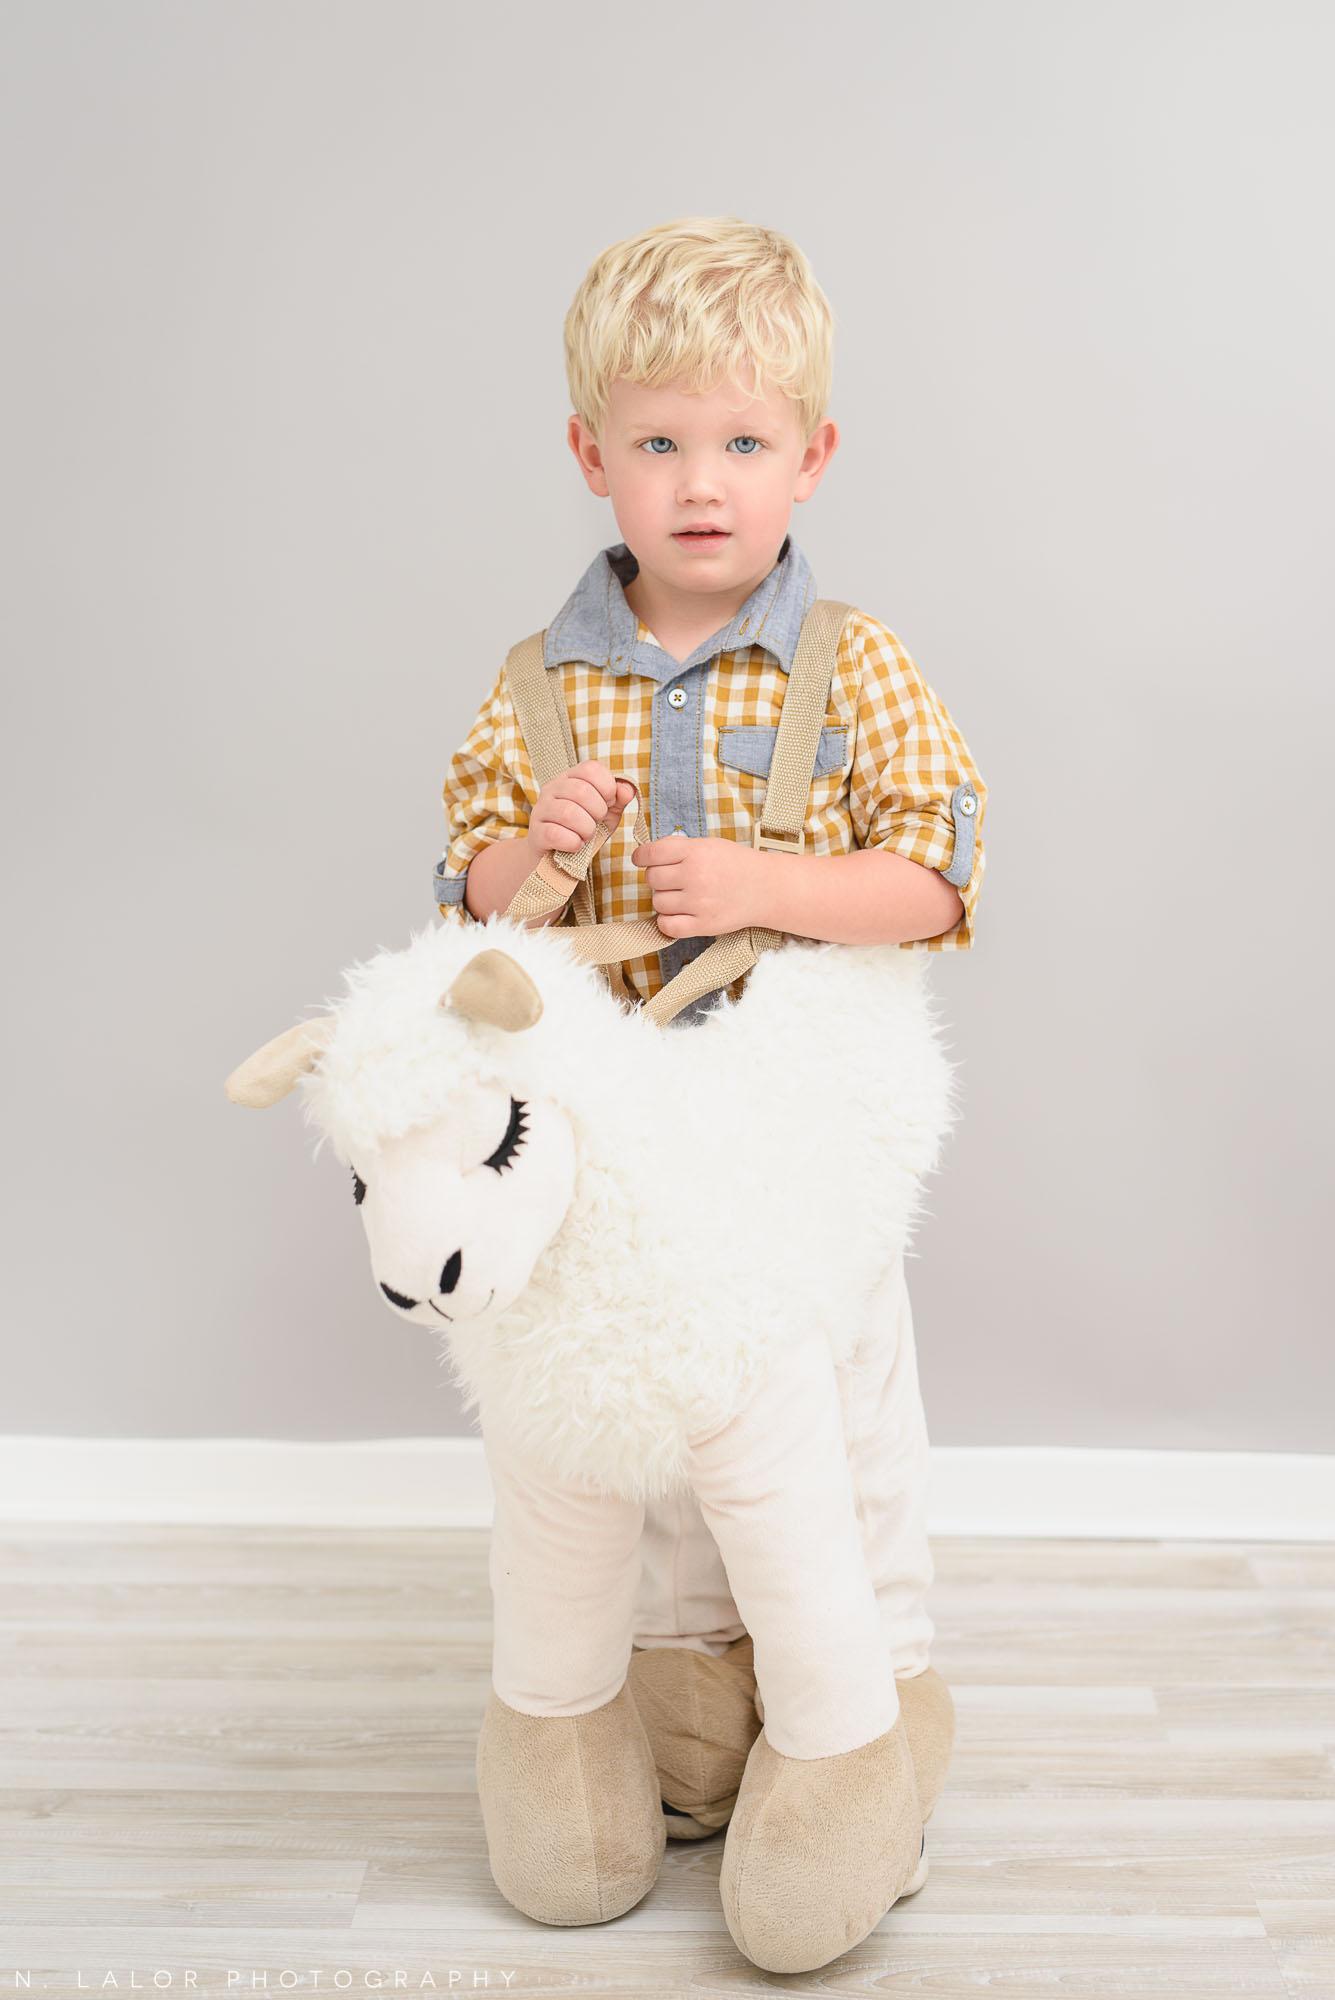 Little llama. Halloween Kids Portrait by N. Lalor Photography. Greenwich, Connecticut.